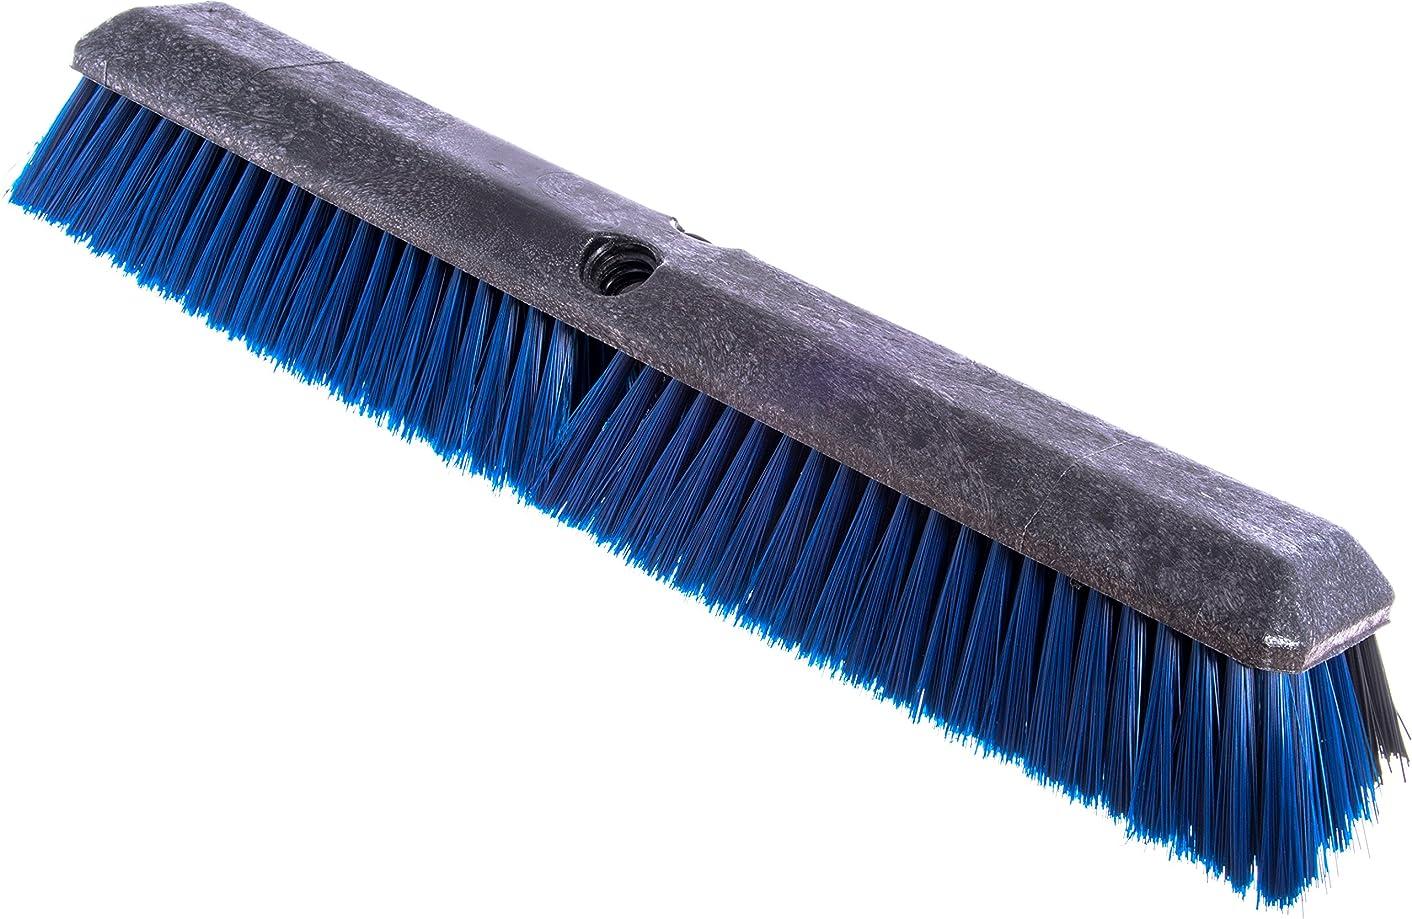 Carlisle 4188100 Sparta Commercial Broom Head, 24